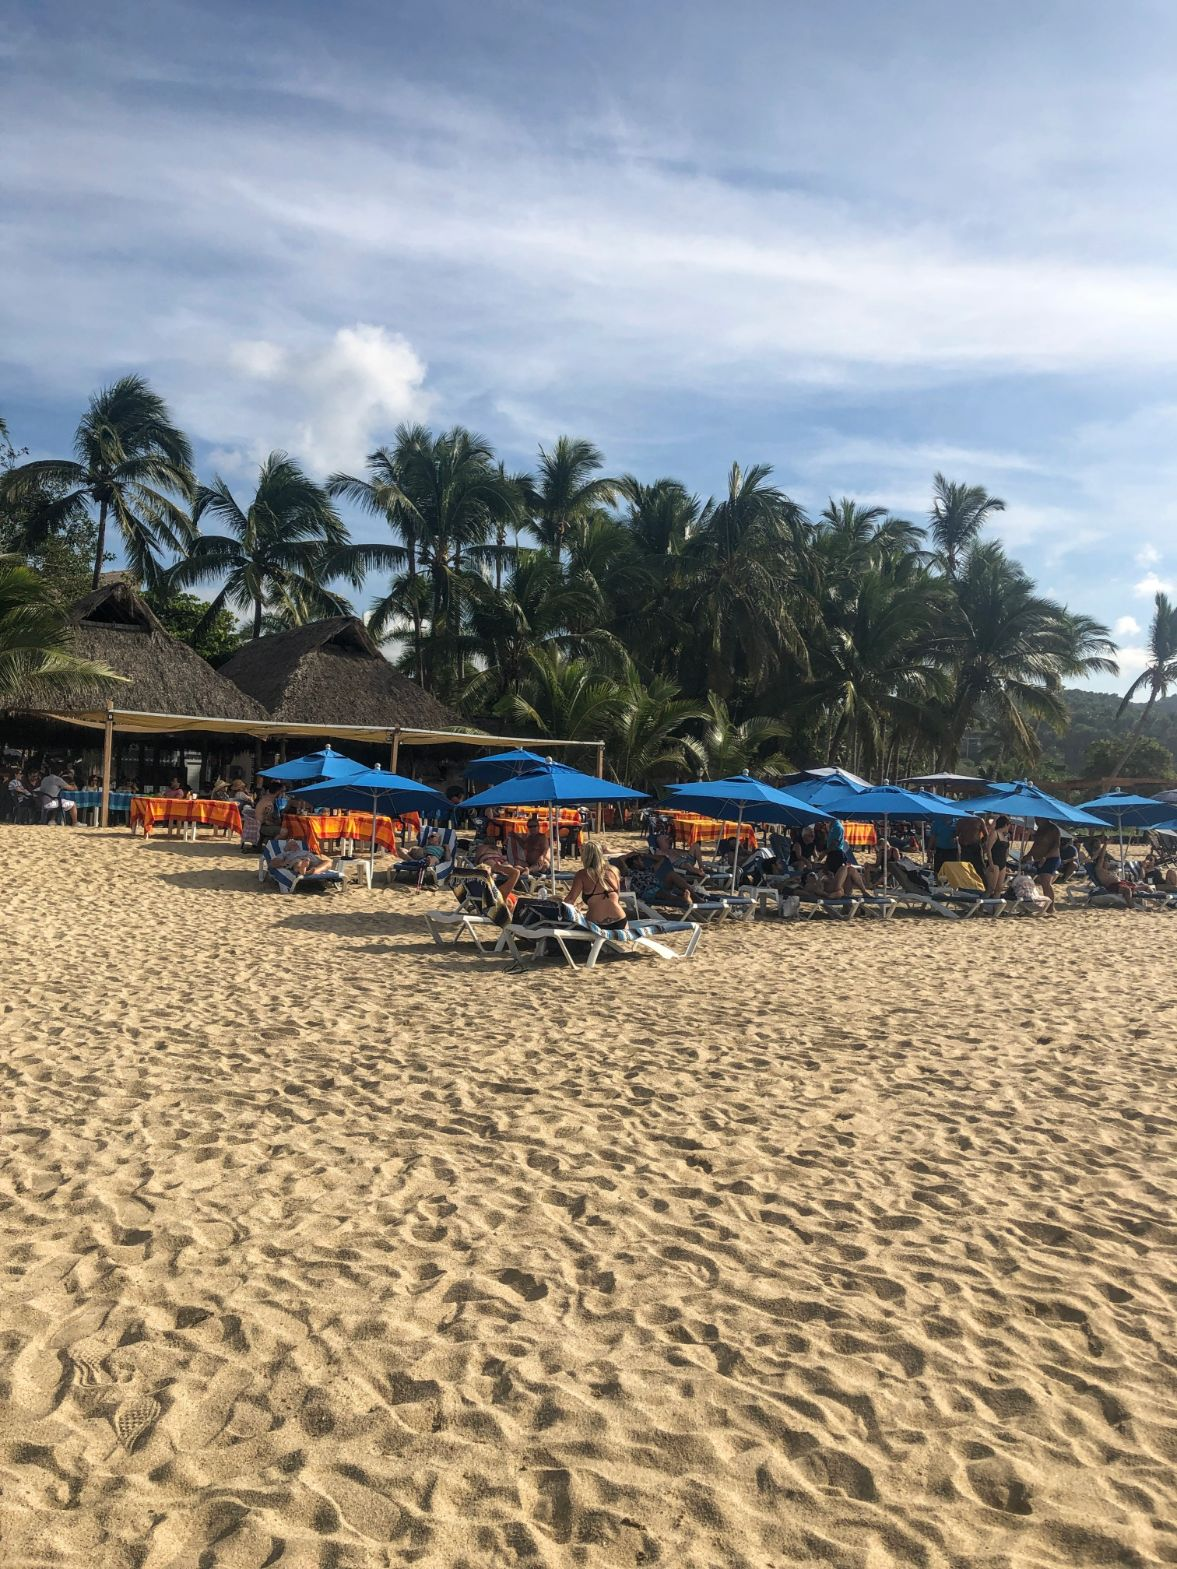 beach chairs and palm trees on San Pancho beach